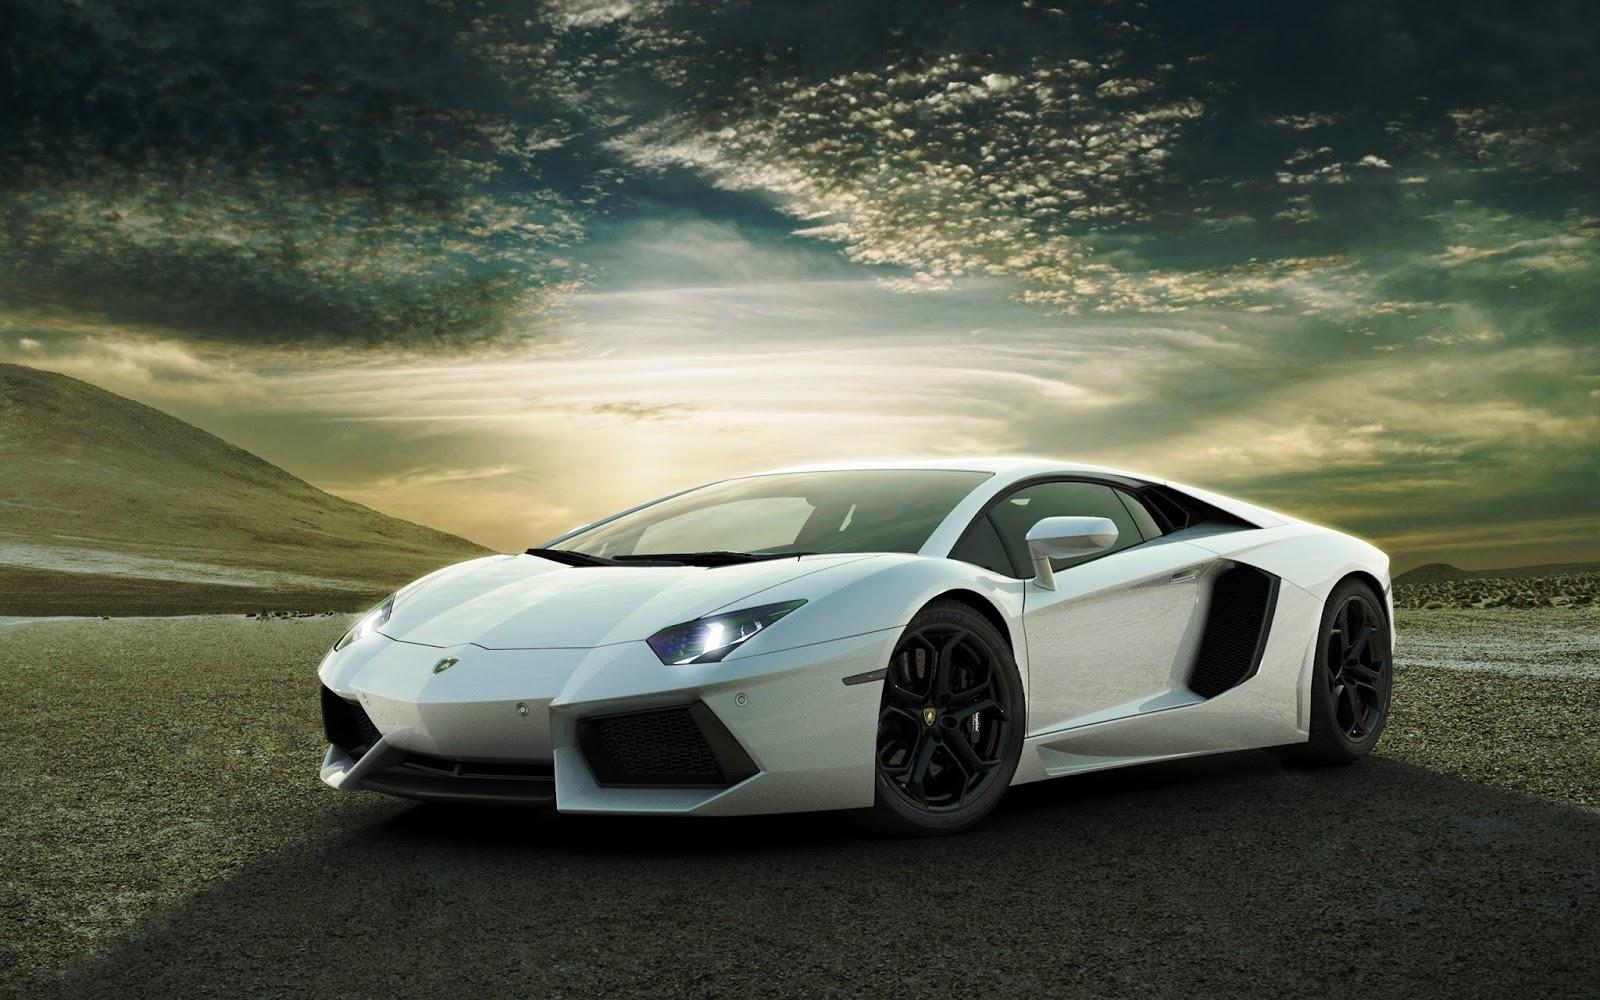 Gambar Mobil Lamborghini: Gambar Transportasi : Gambar Mobil Sport Lamborghini Aventador